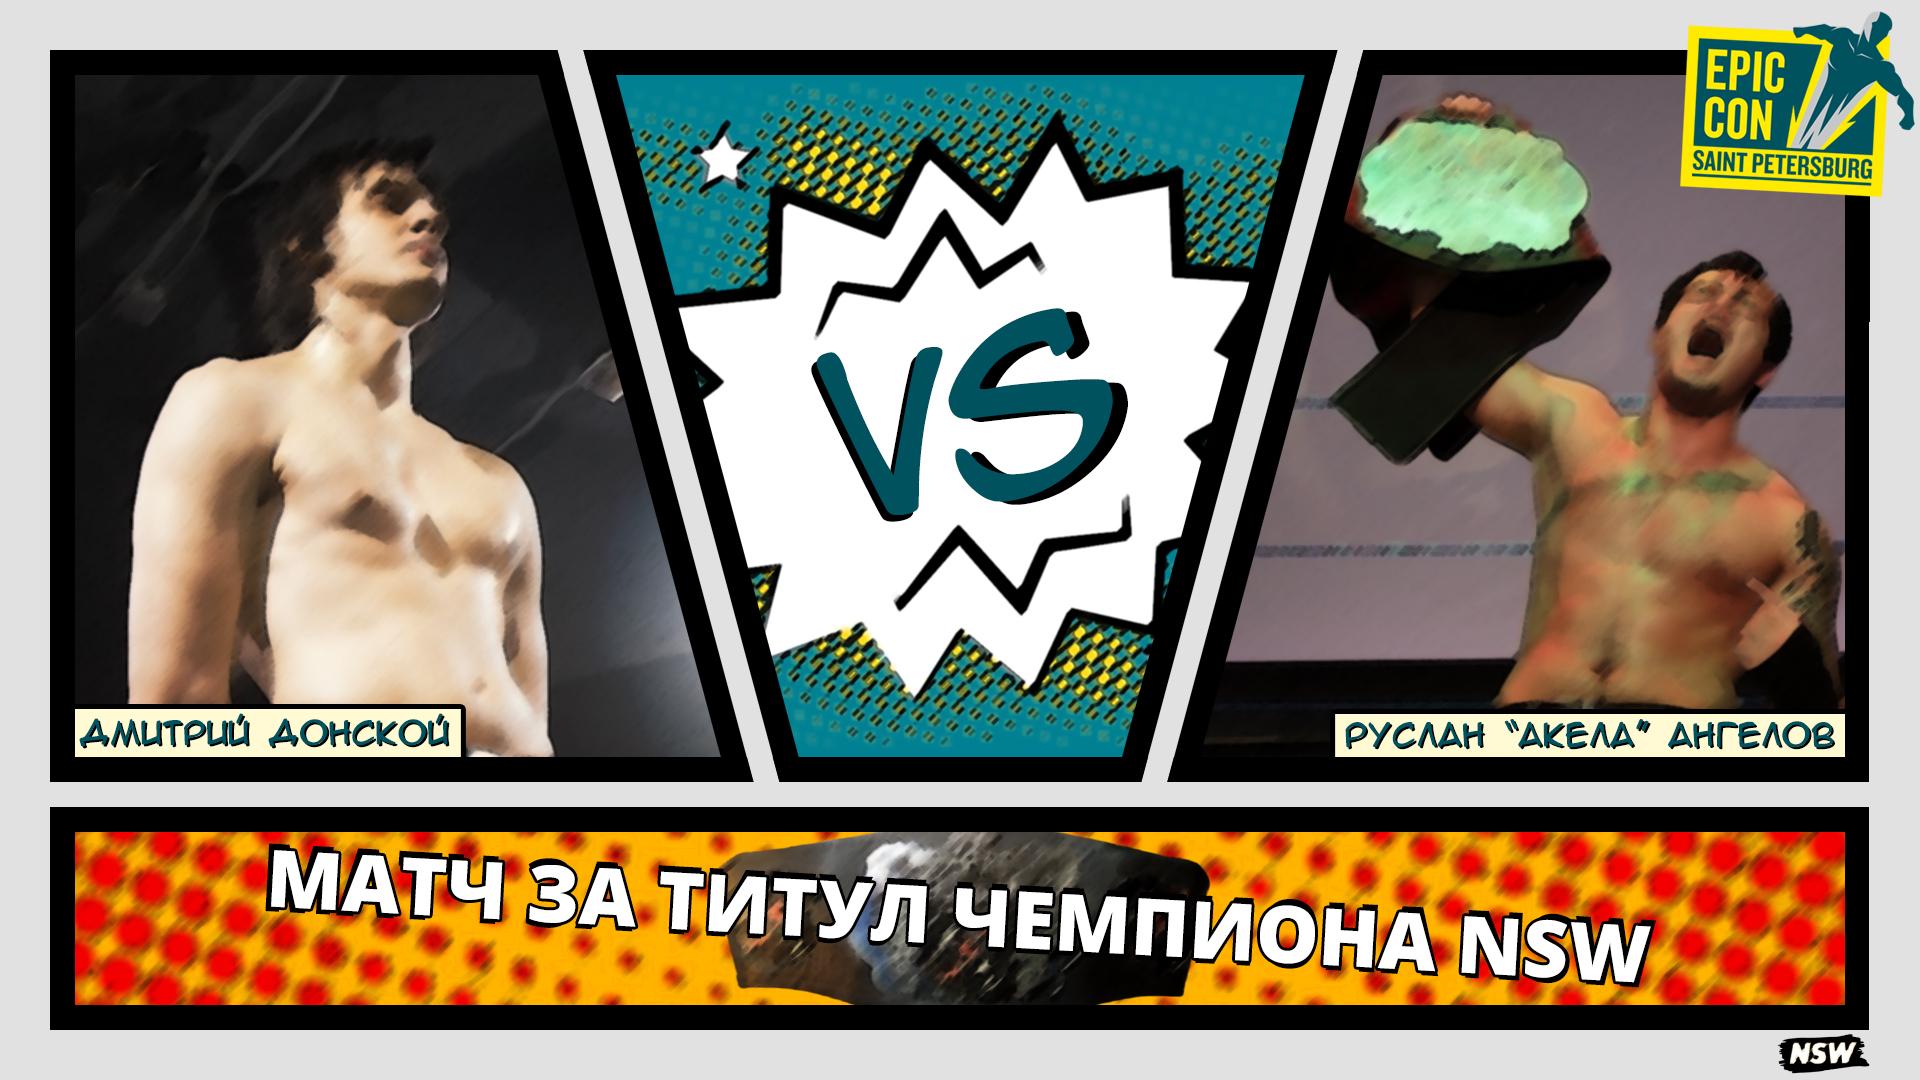 NSW Epic Con 2017: Дмитрий Донской против Руслана 'Акелы' Ангелова